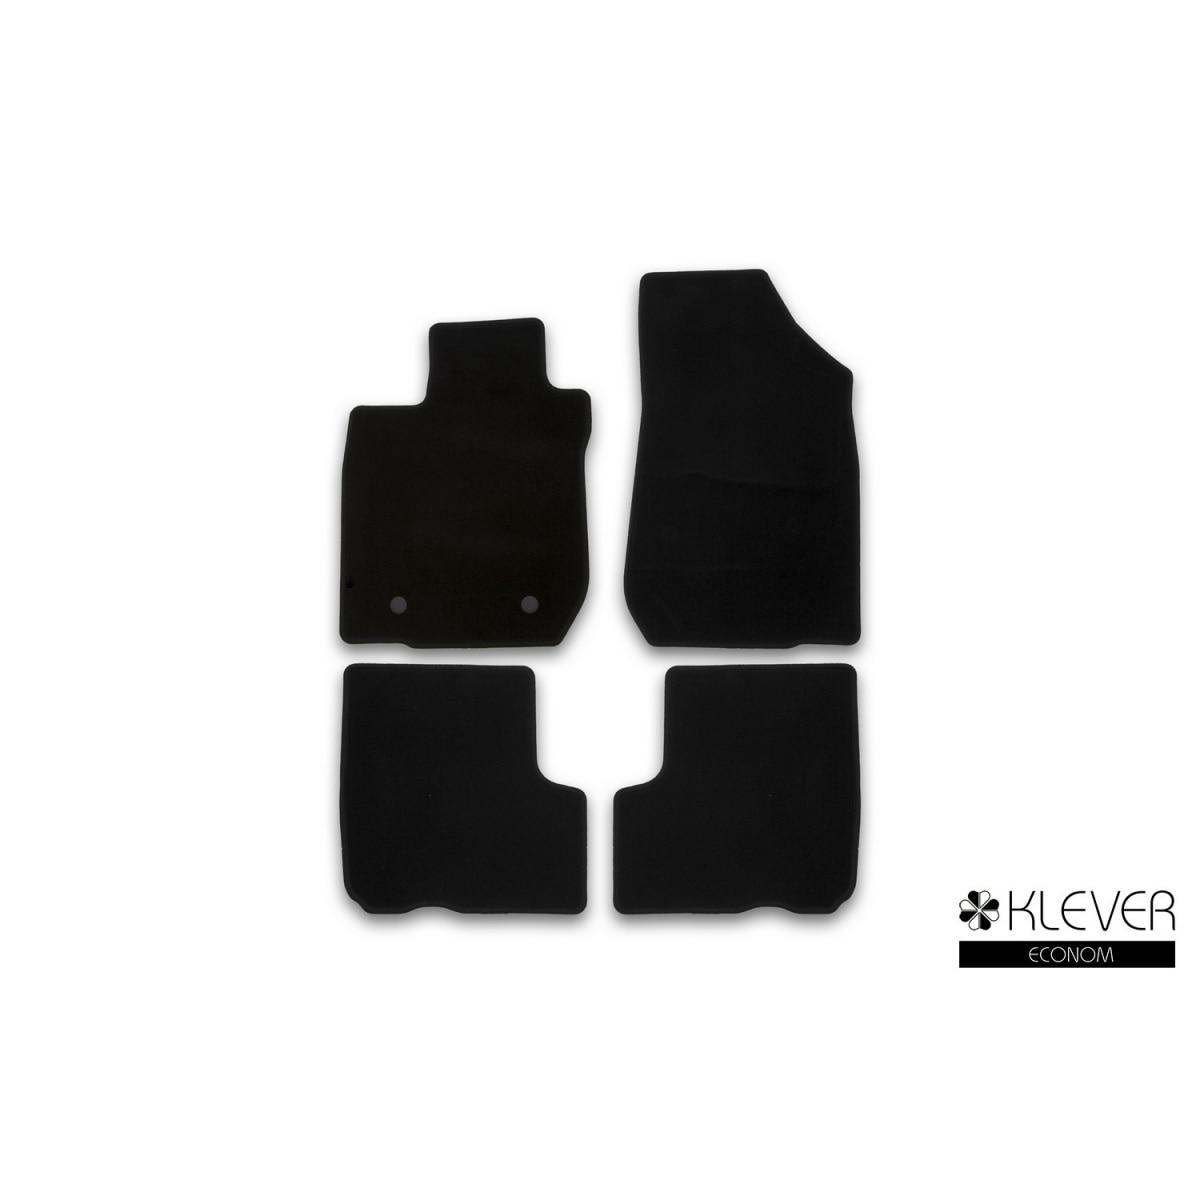 Floor mats Klever econom Lada Largus 5 seats 2012  UN. 4 PCs (textiles) lergus)|Floor Mats| |  - title=